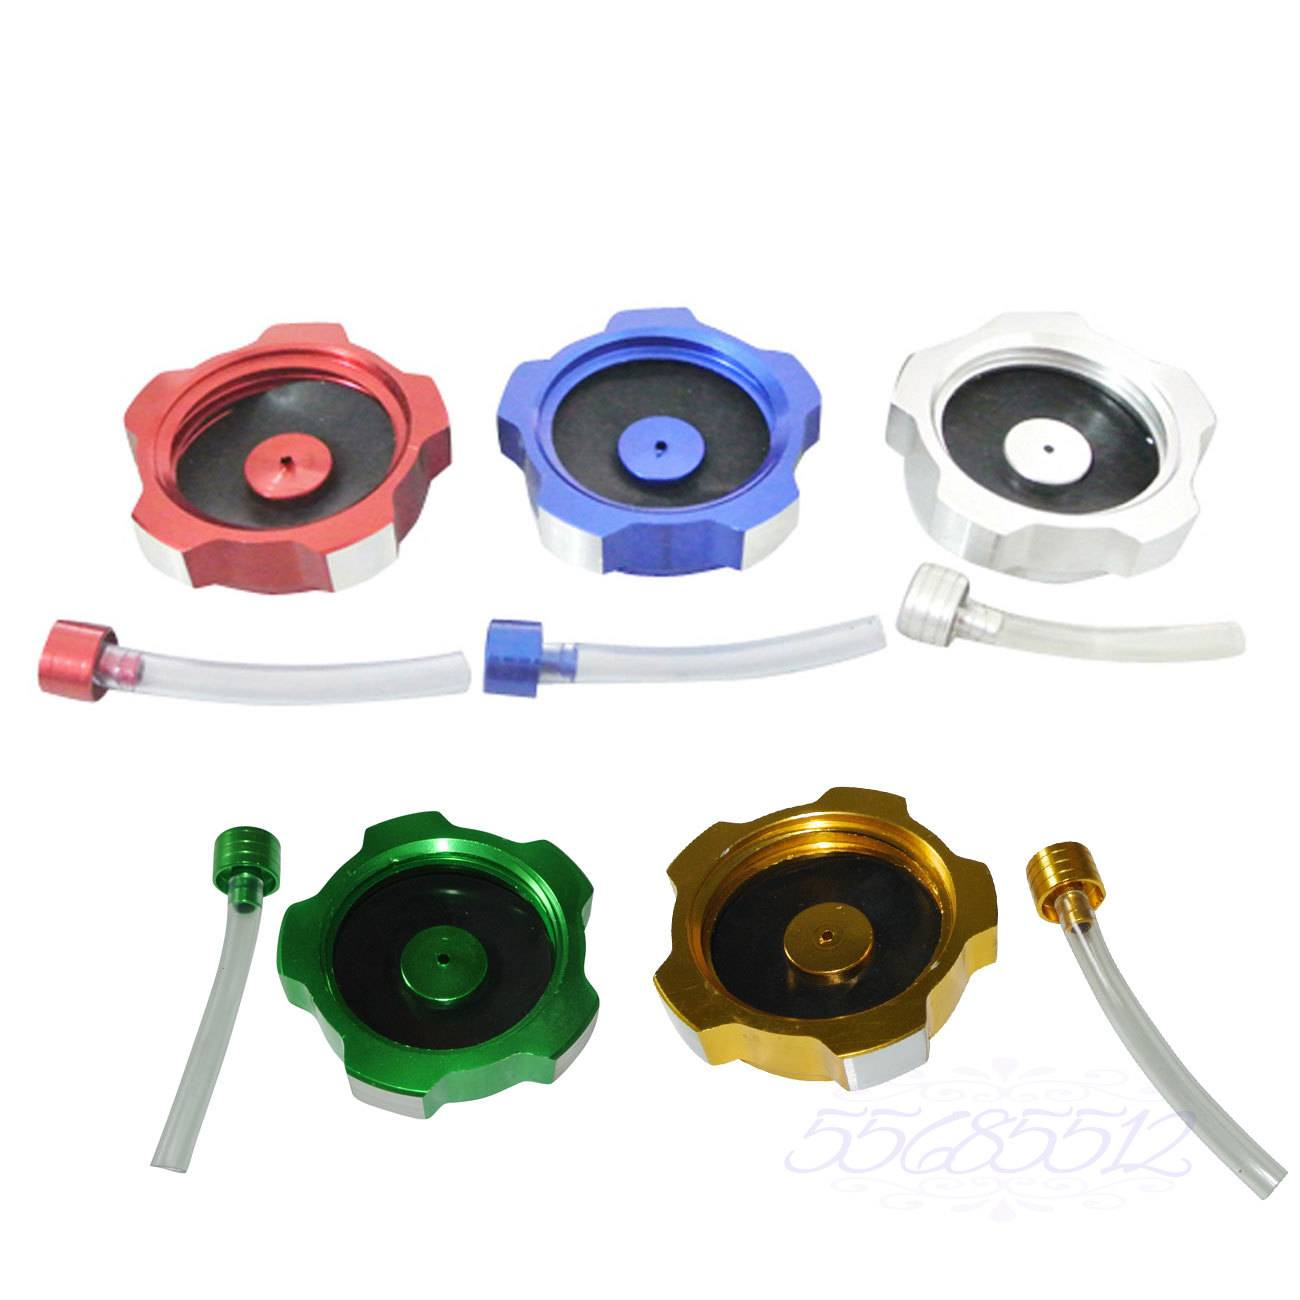 JRL Gas Fuel Cap Fit SSR SDG Pitster Pro Thumpstar Honda Pit Bike Red